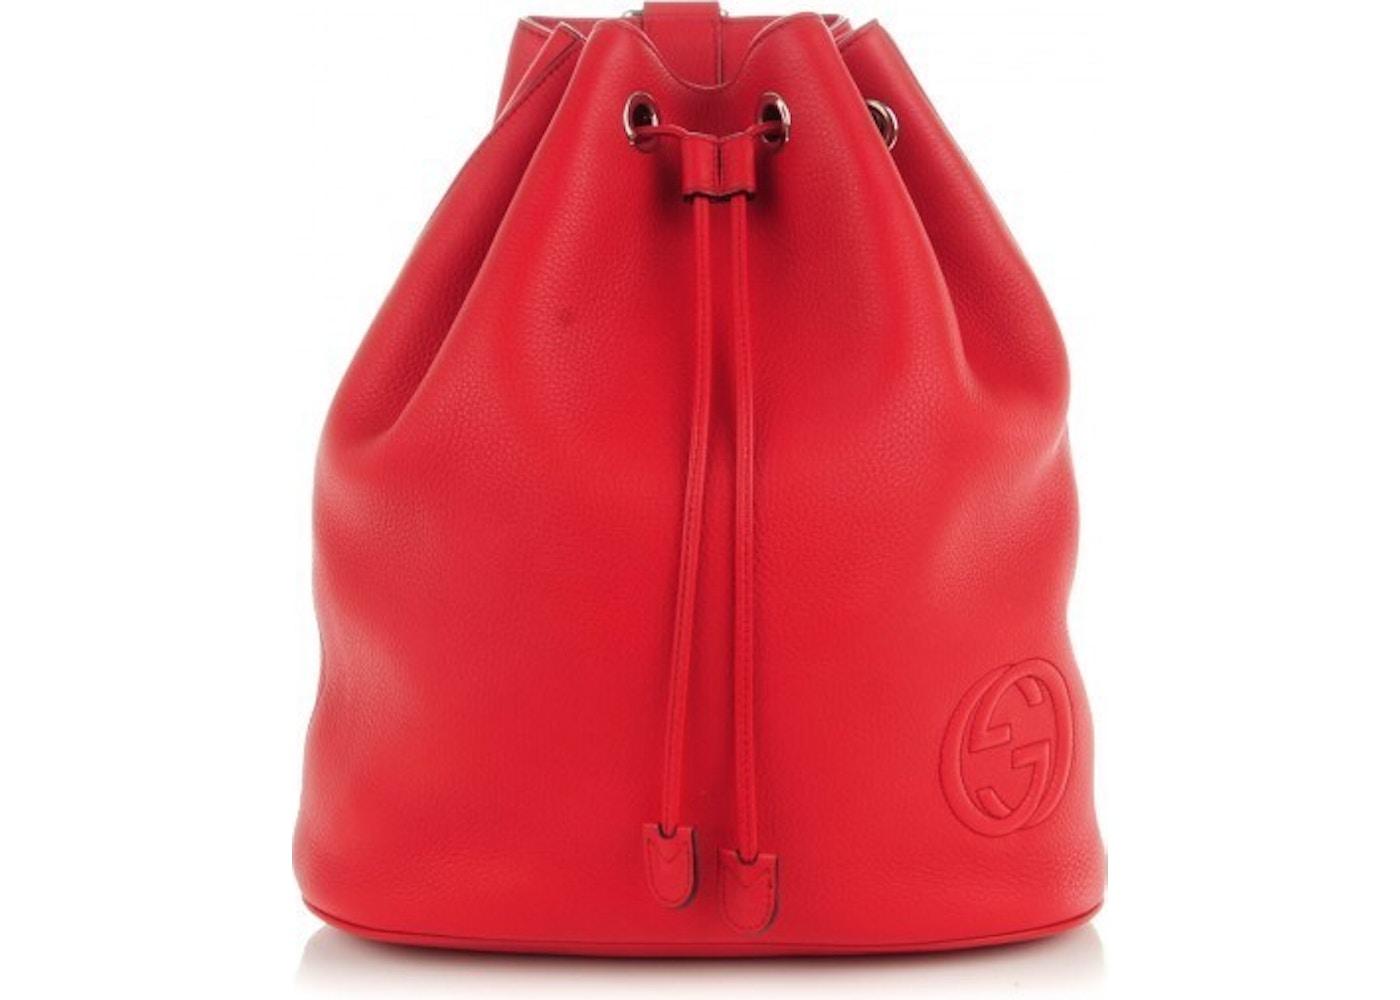 74fa70a93db Sell. or Ask. View All Bids. Gucci Soho Drawstring Backpack ...